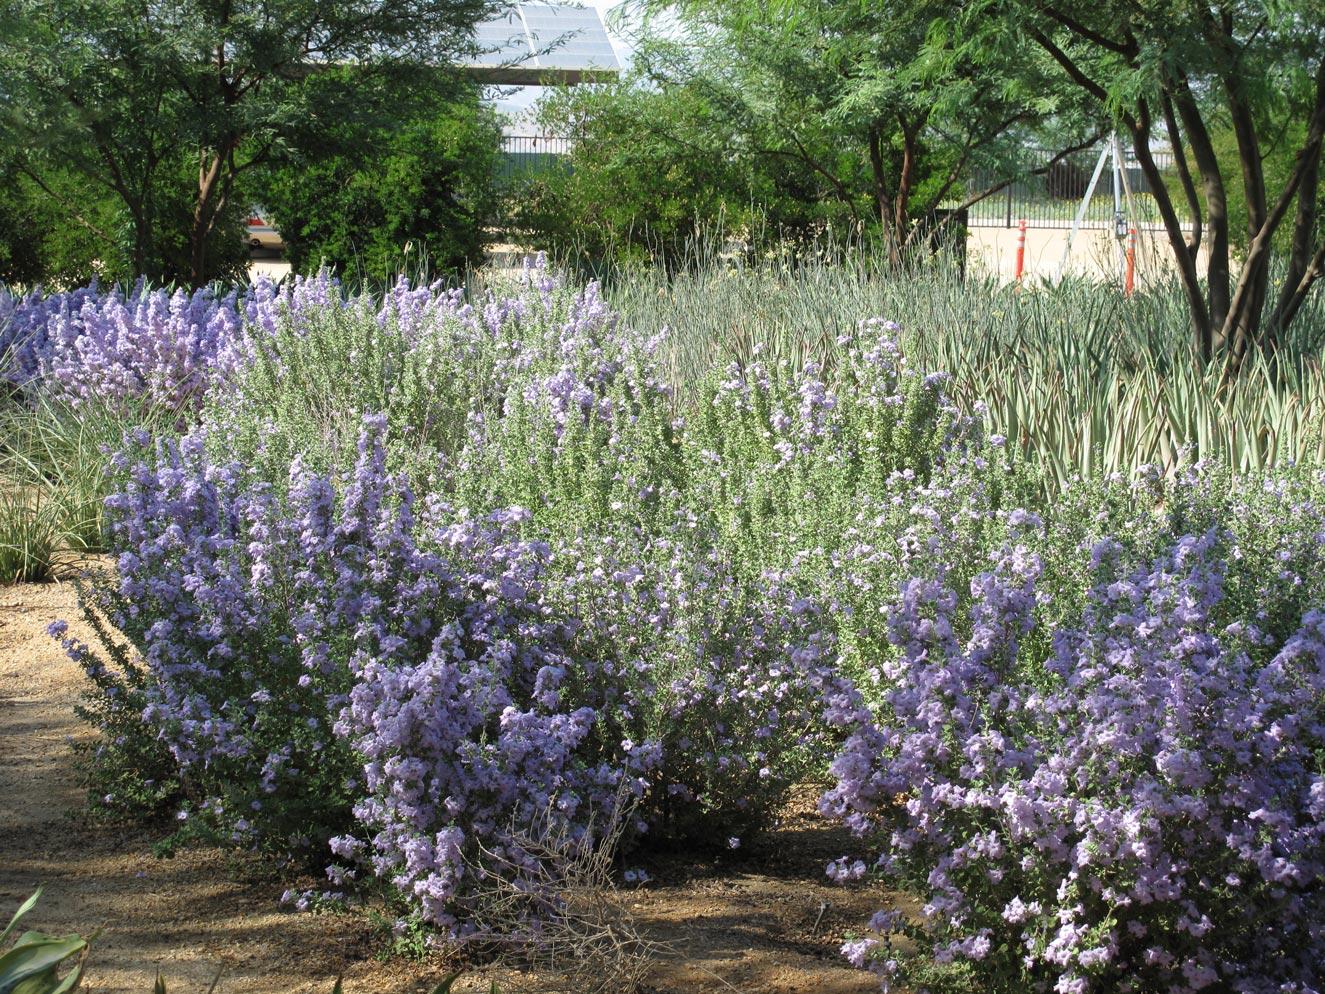 Leucophyllum plants filled with light purple blooms.